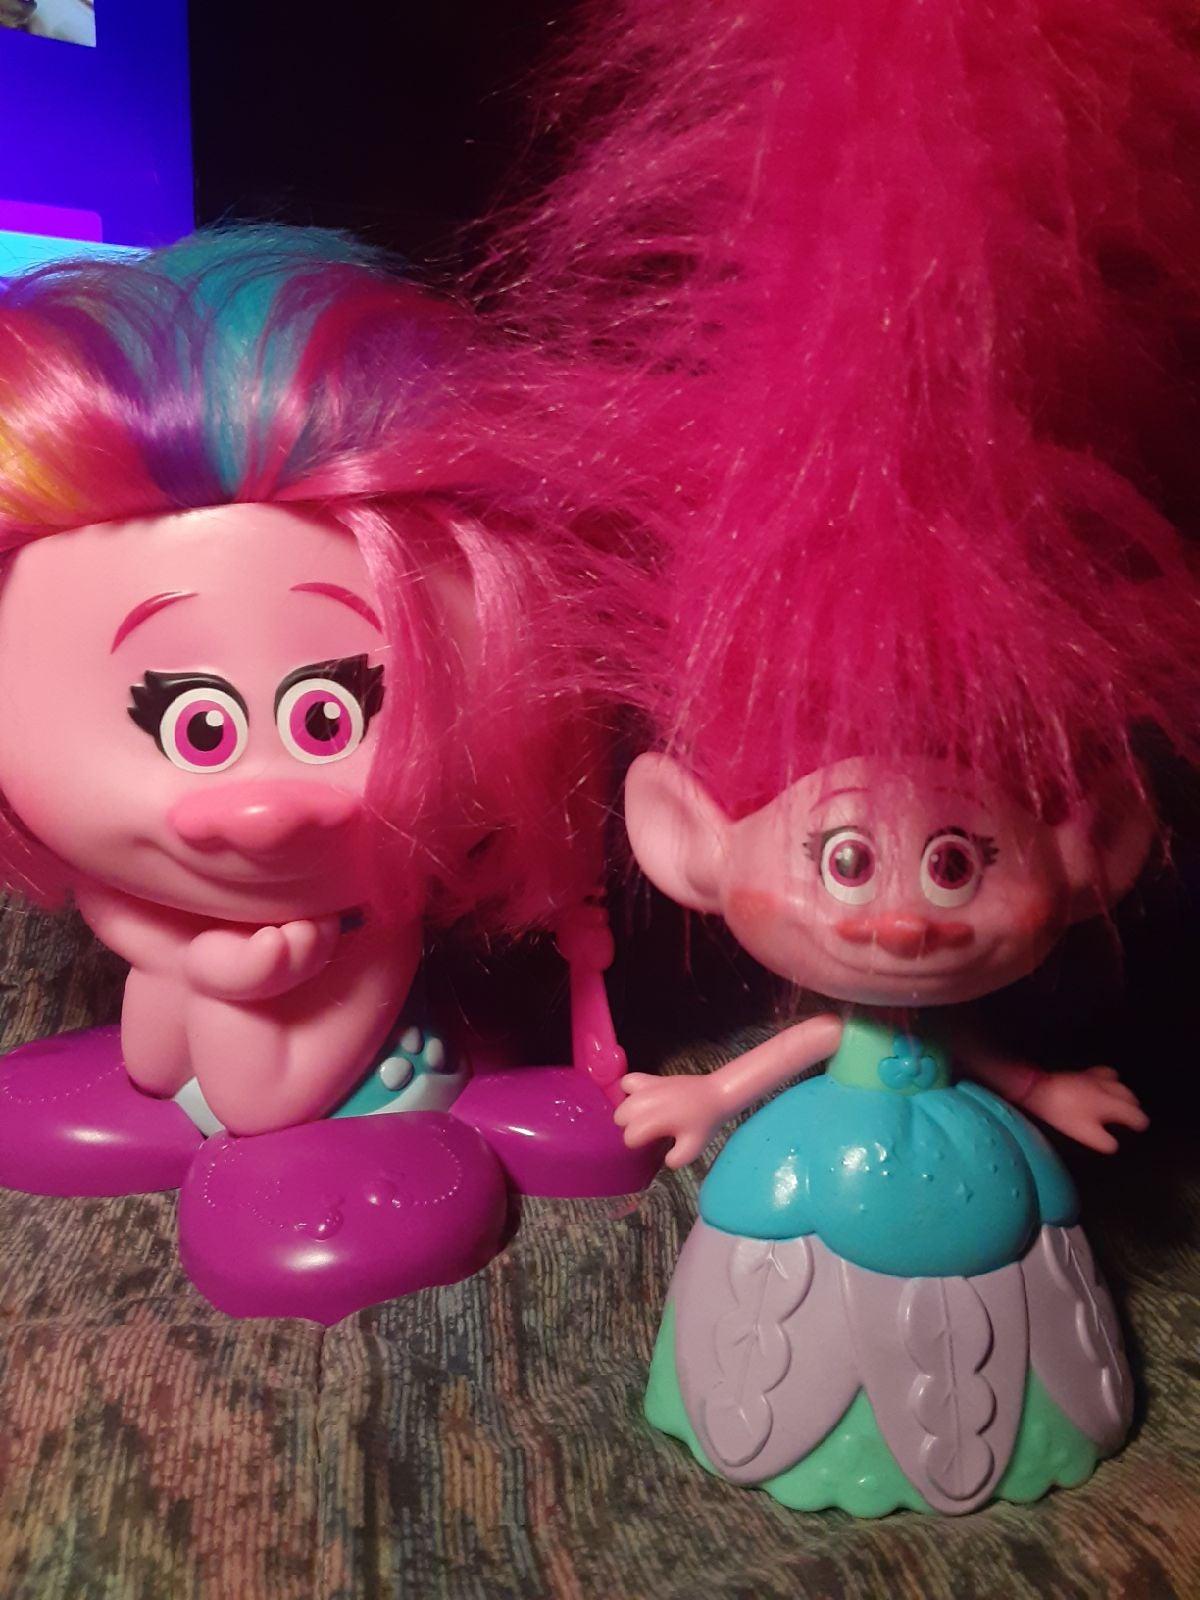 Trolls the movie poppy hair style with c